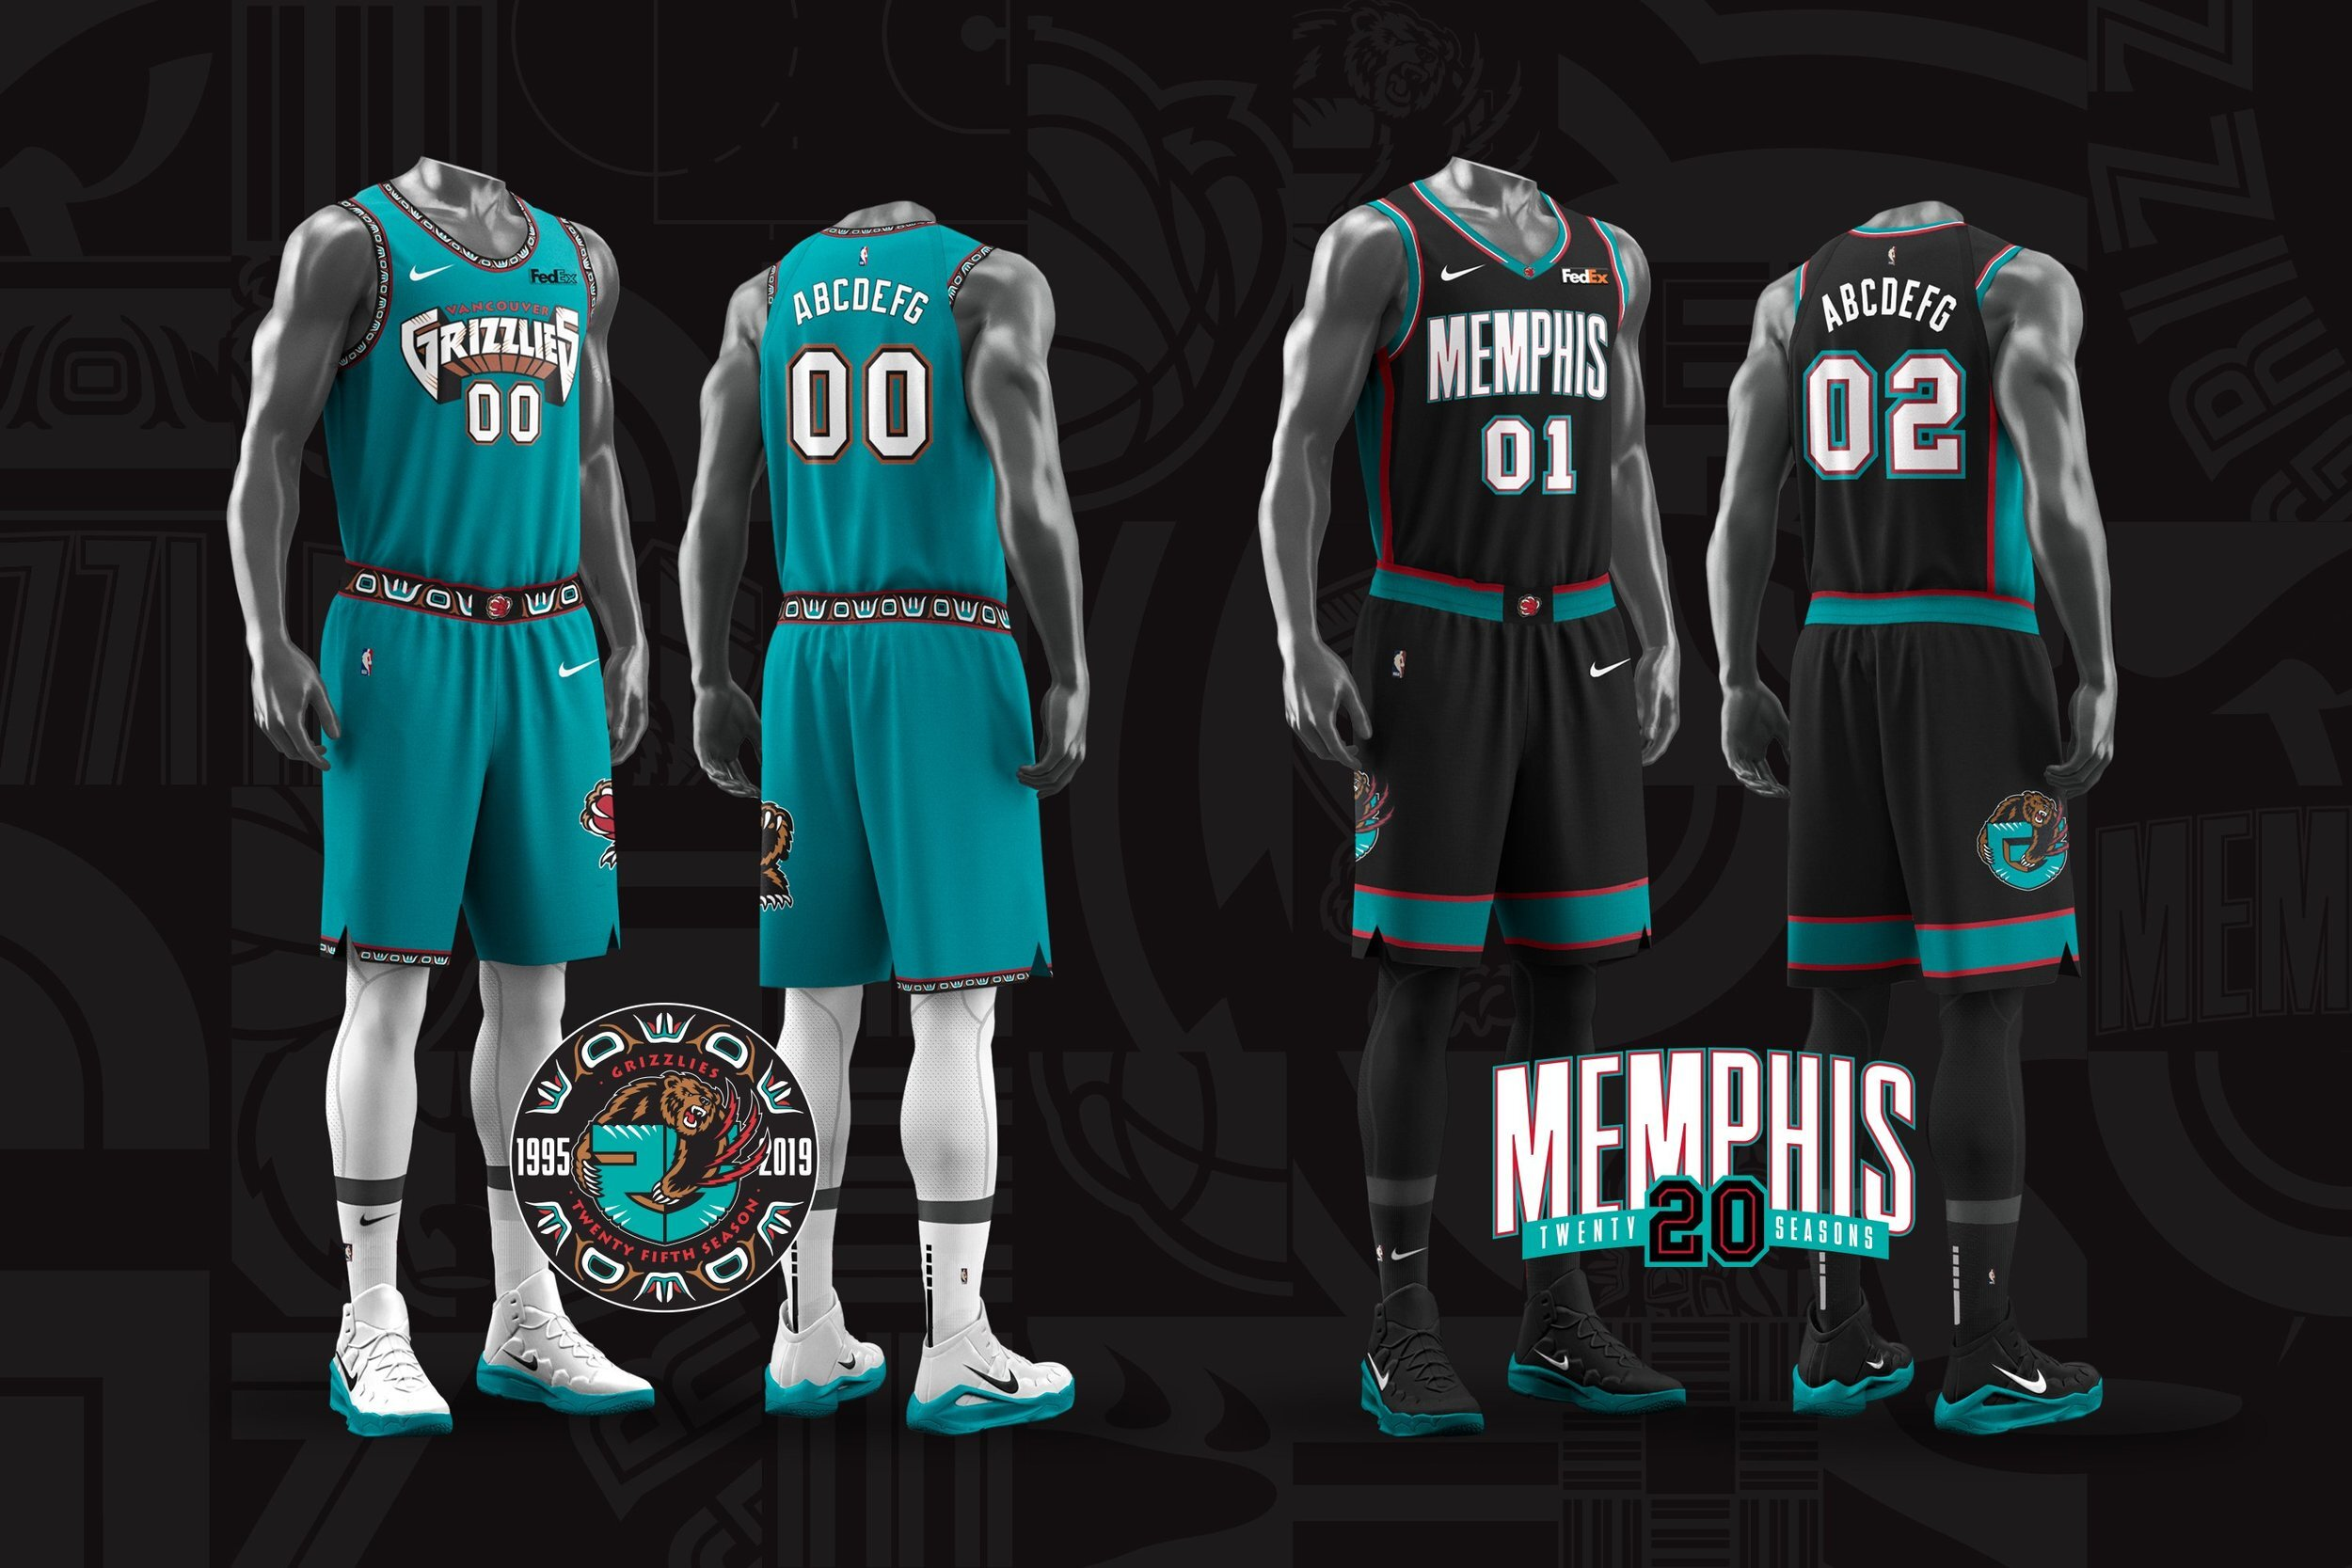 new nba uniforms